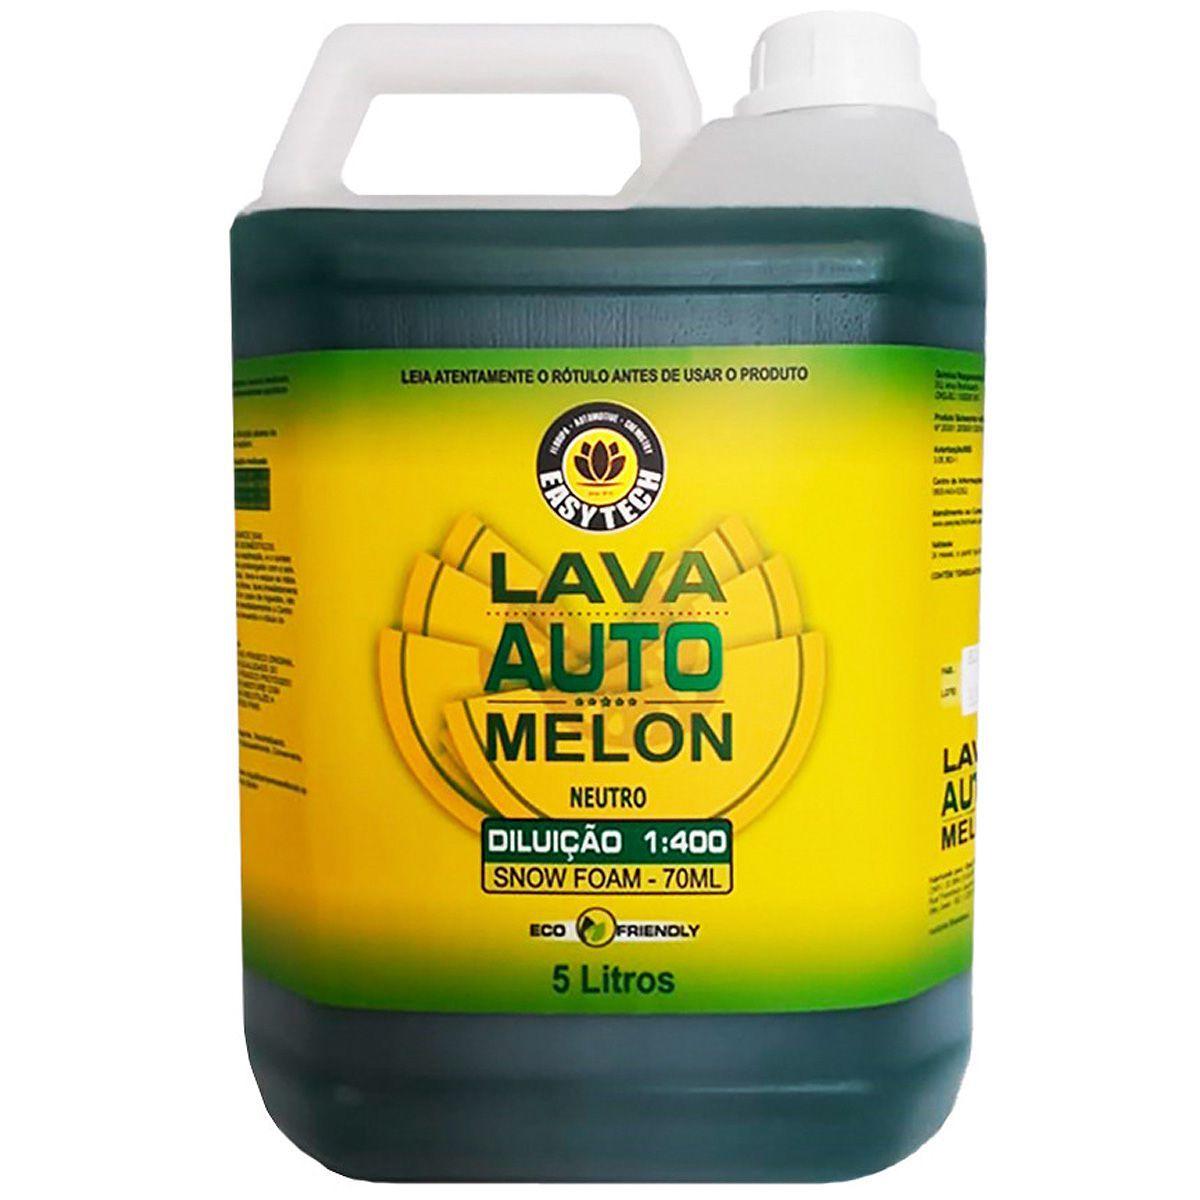 Kit Melon,Higicouro,Hidracouro,Rejuvex,2 Ceras,Pretinho,Spotfree